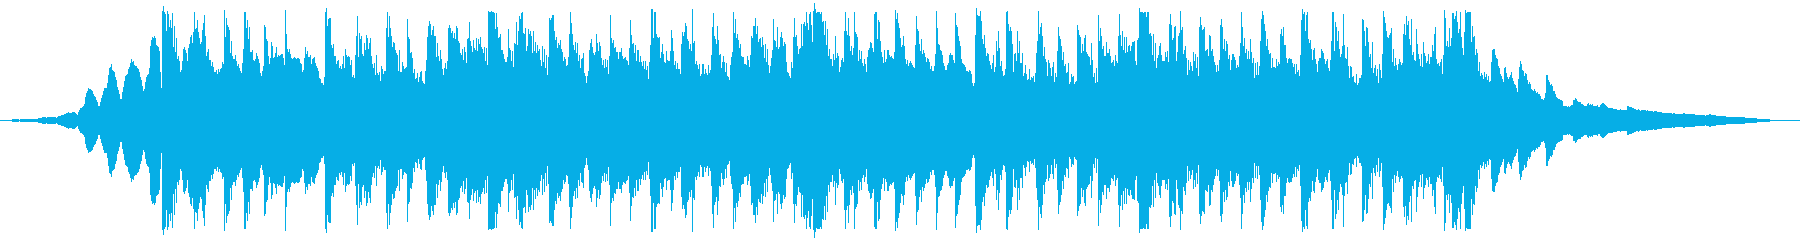 CM用22秒、次世代、スタイリッシュ製品の再生済みの波形